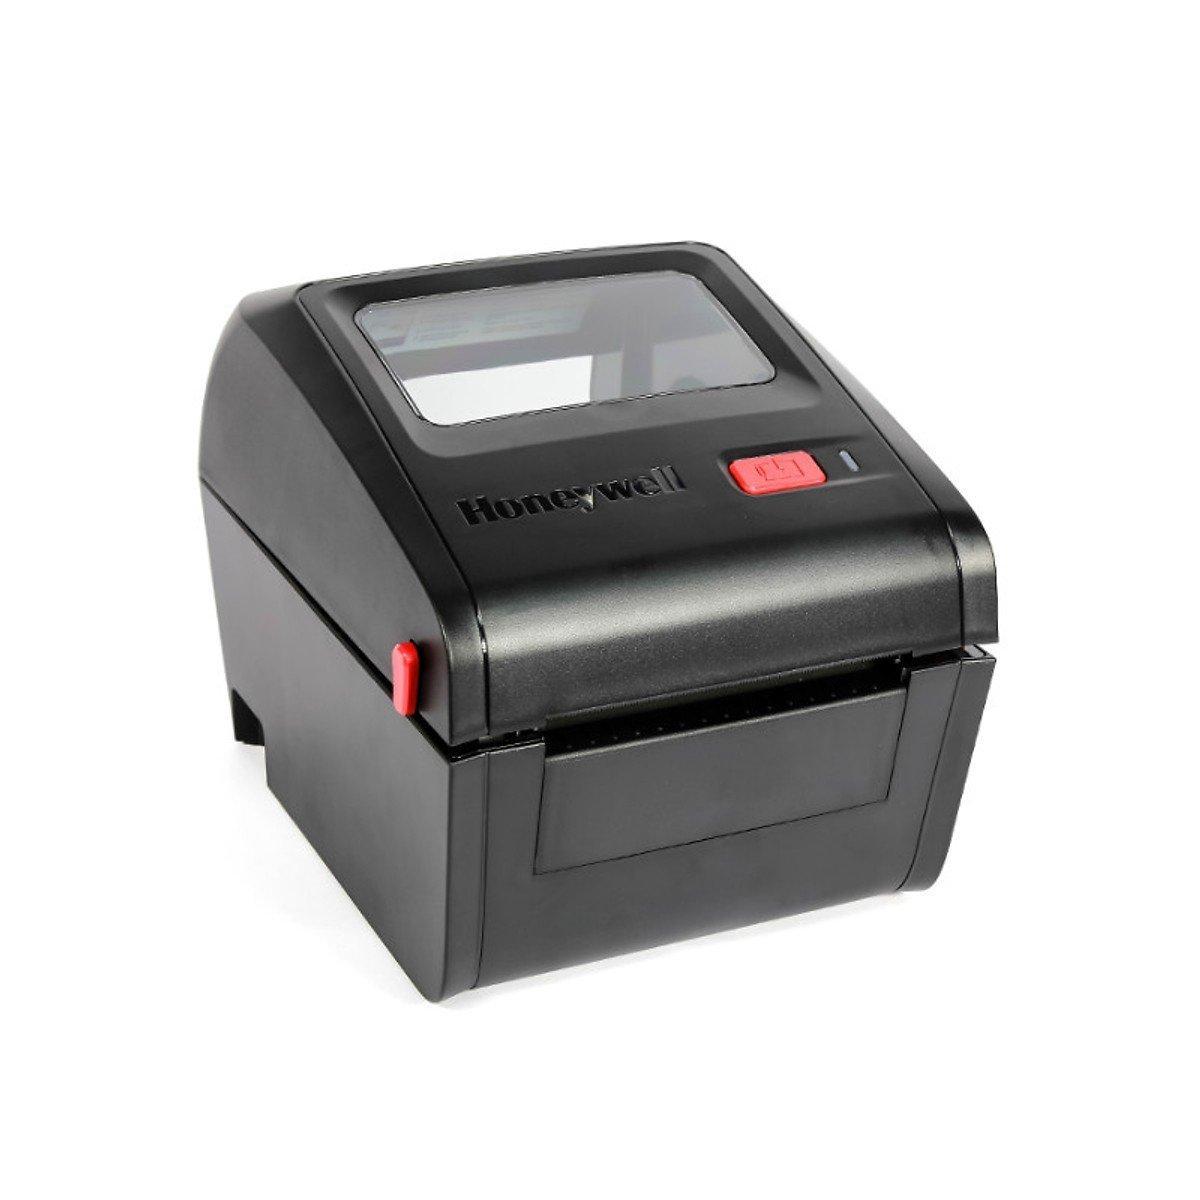 DT Принтер Honeywell PC42D, 8ips, 203dpi, USB